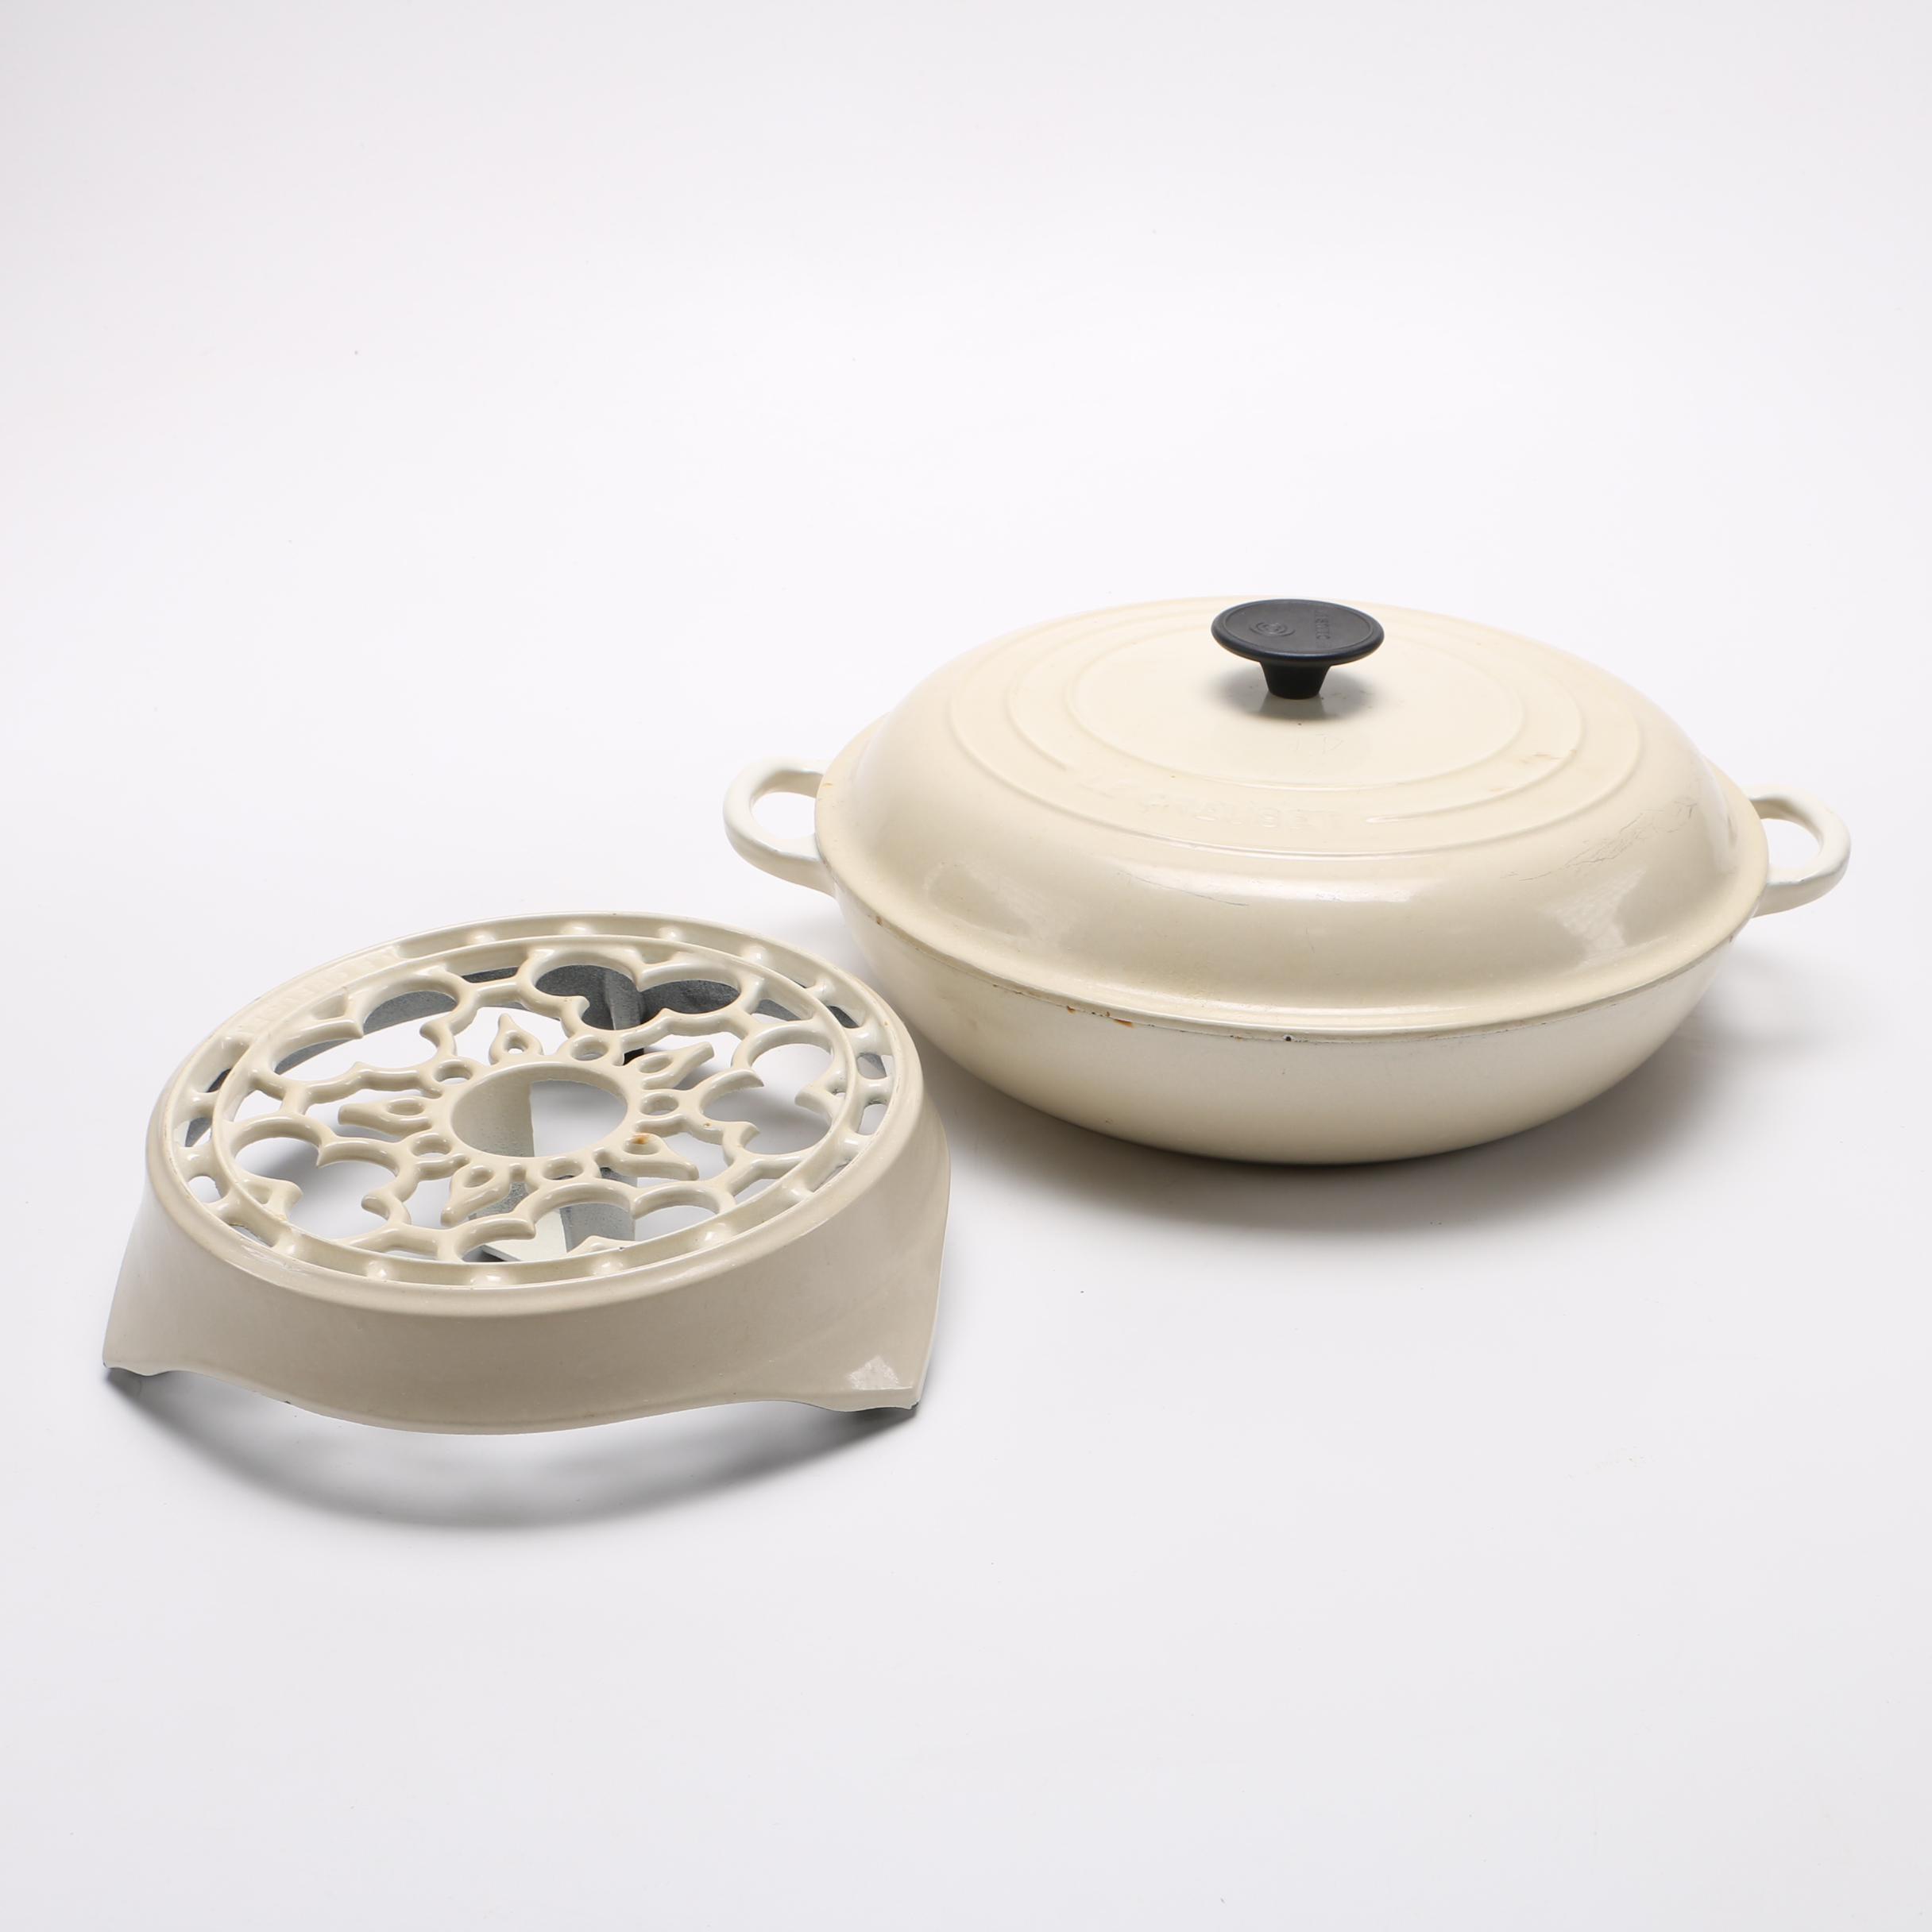 Le Creuset Glazed Cast Iron Cookware